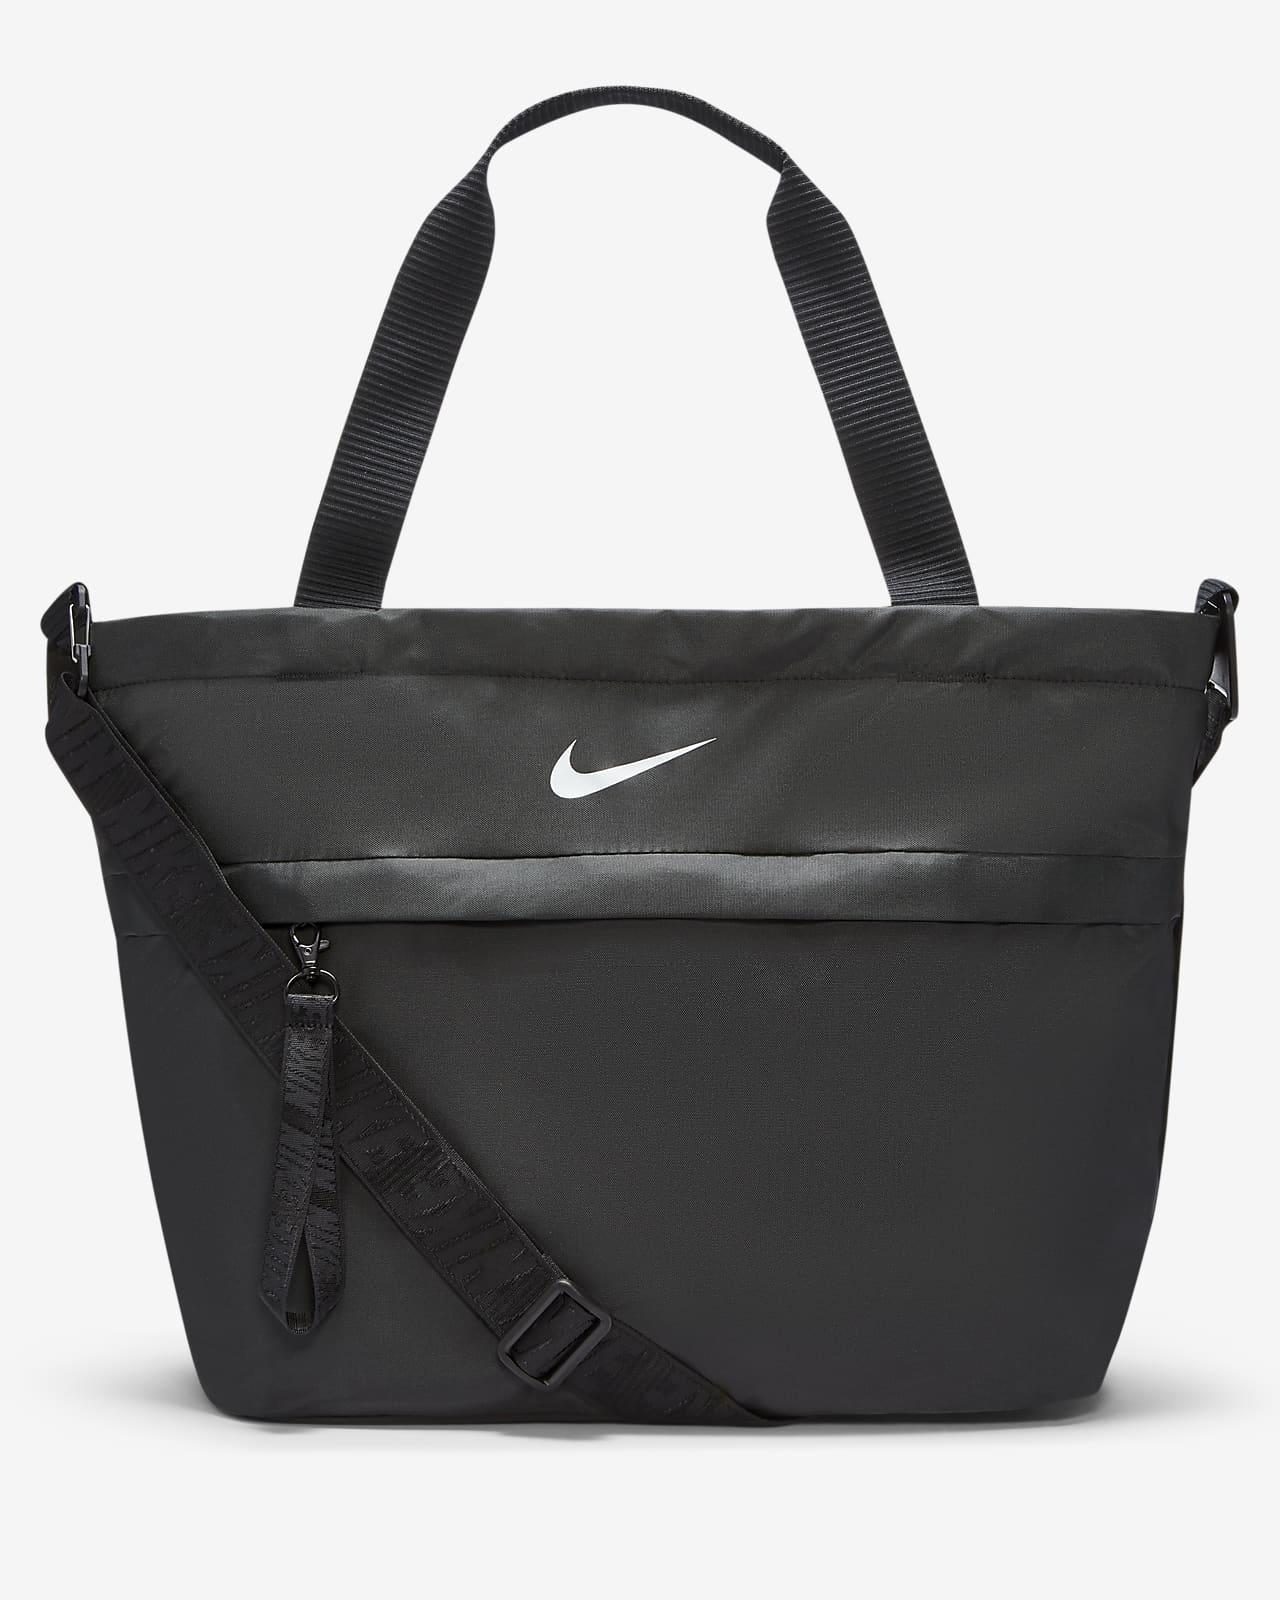 Taška Nike Sportswear Essentials